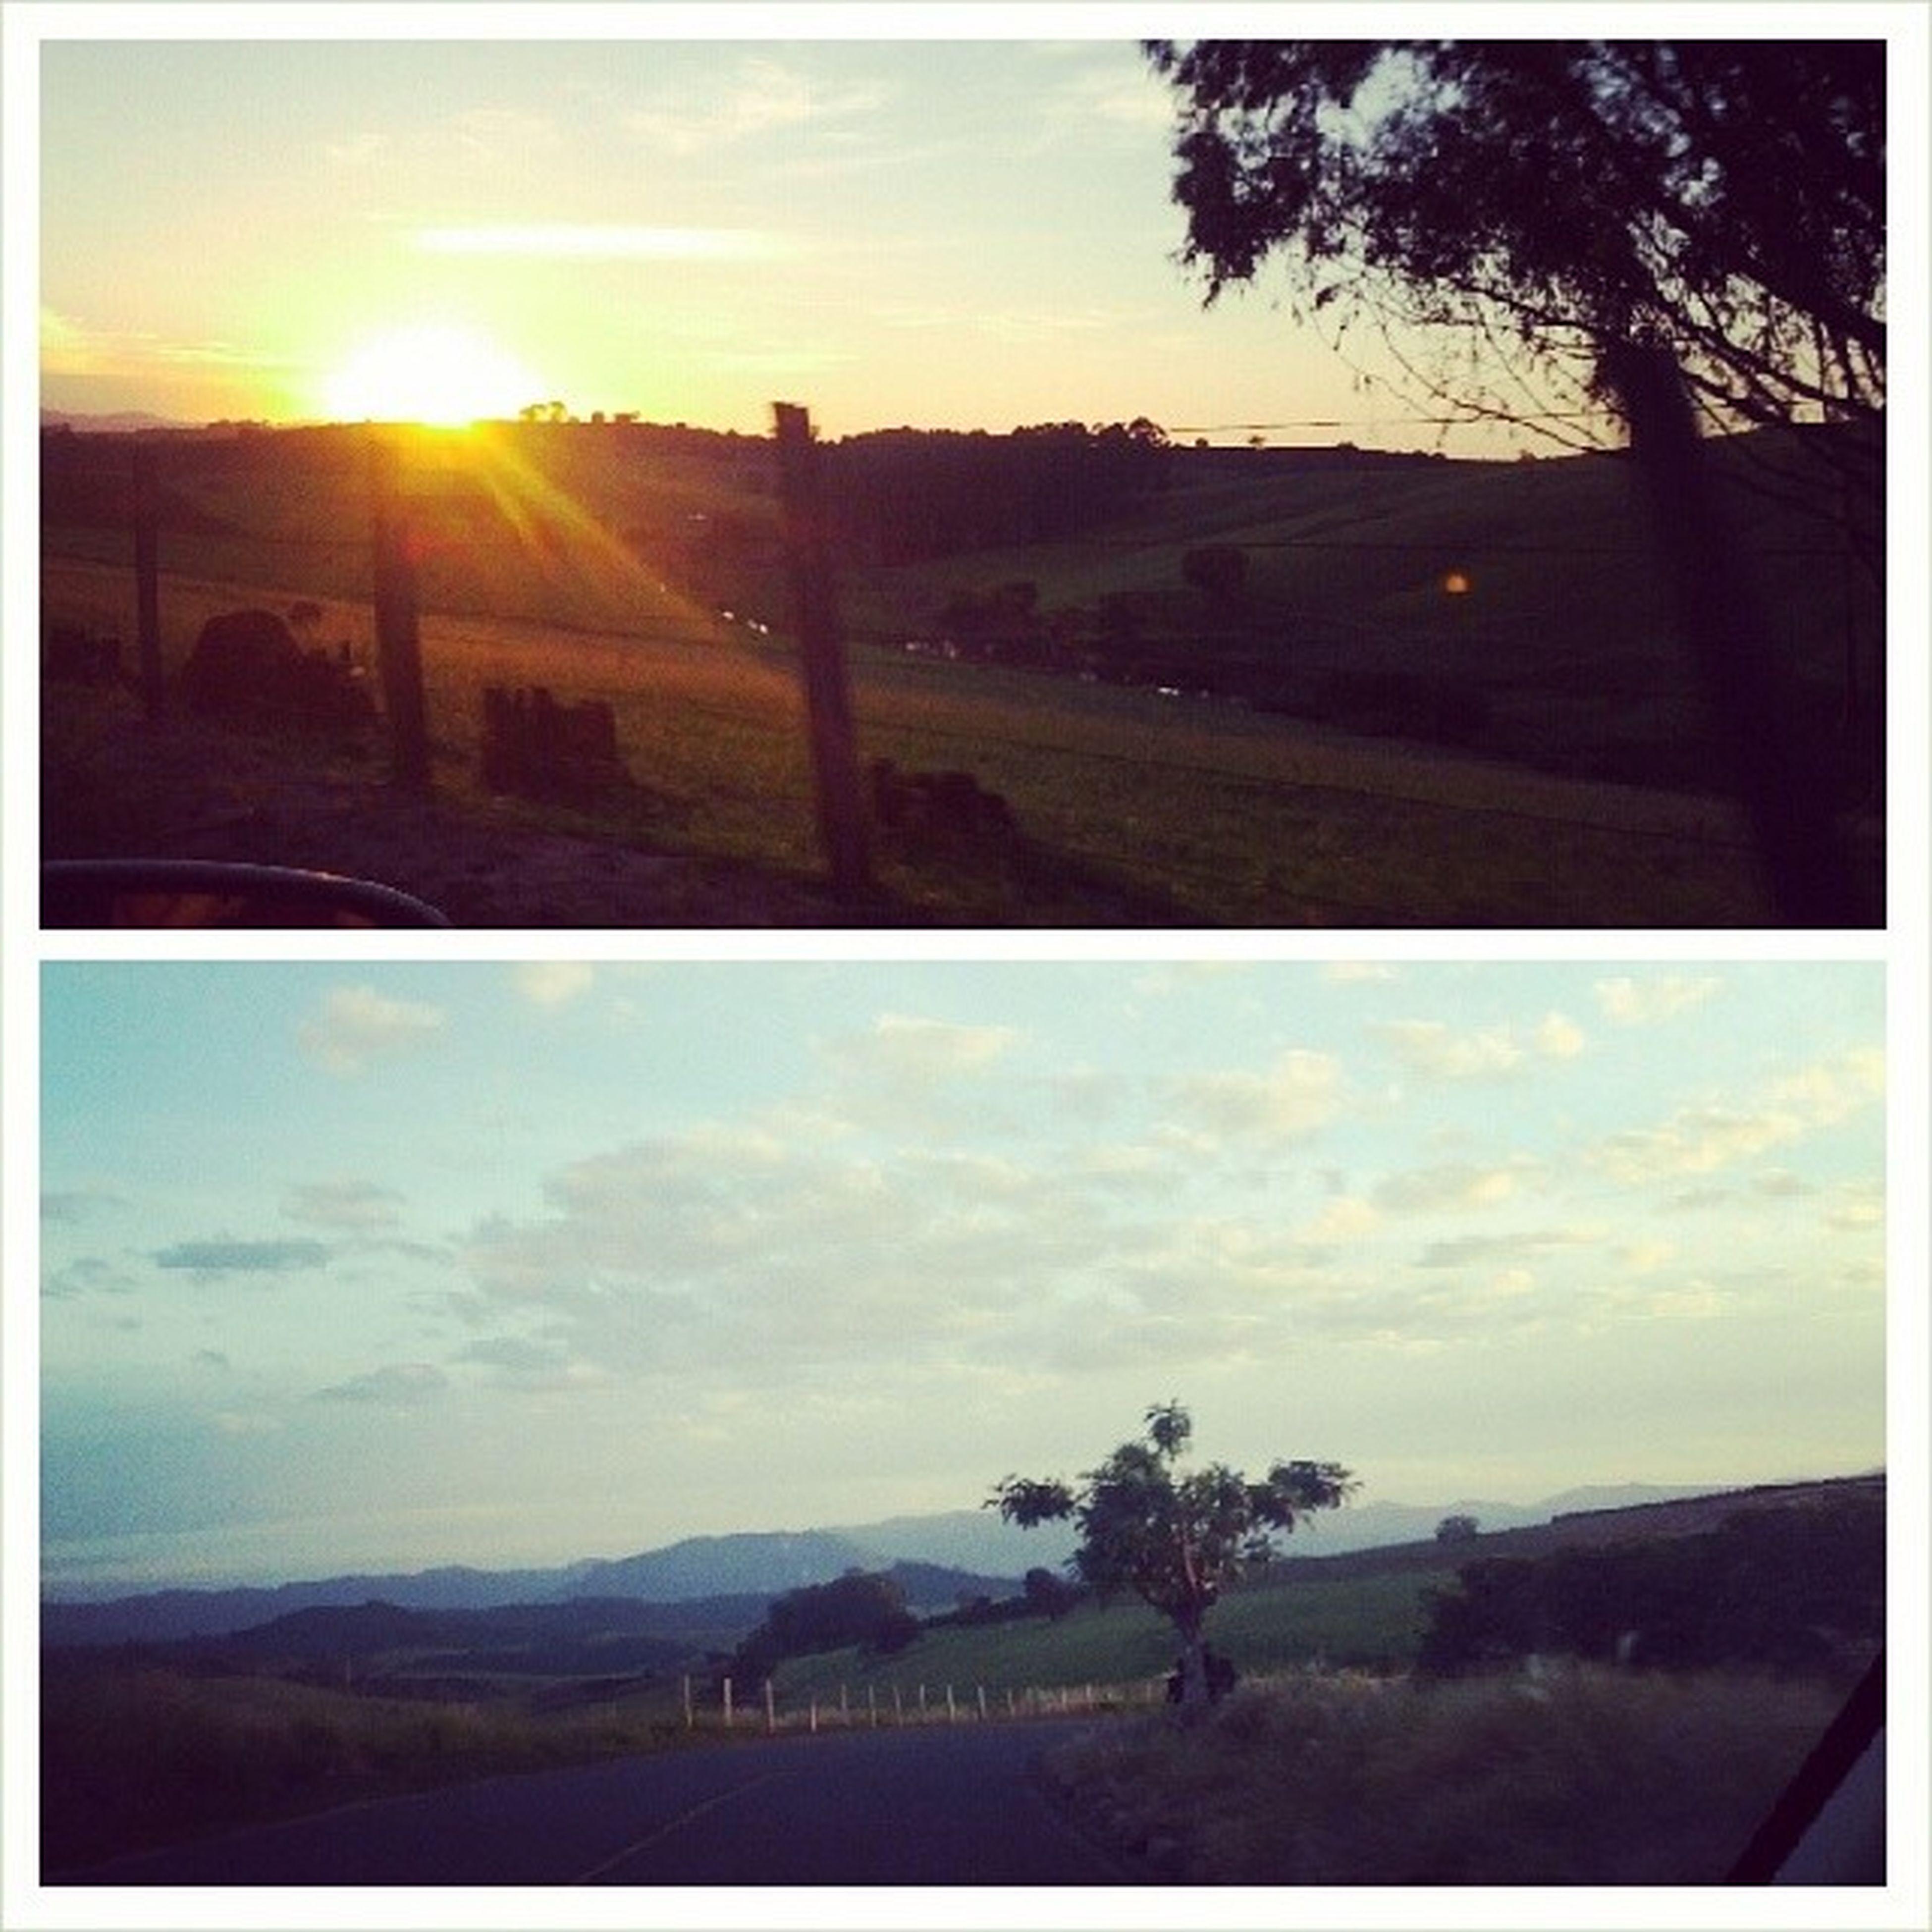 sunset, sun, landscape, sky, tree, tranquil scene, tranquility, scenics, sunlight, transportation, transfer print, beauty in nature, sunbeam, nature, silhouette, field, road, auto post production filter, lens flare, horizon over land